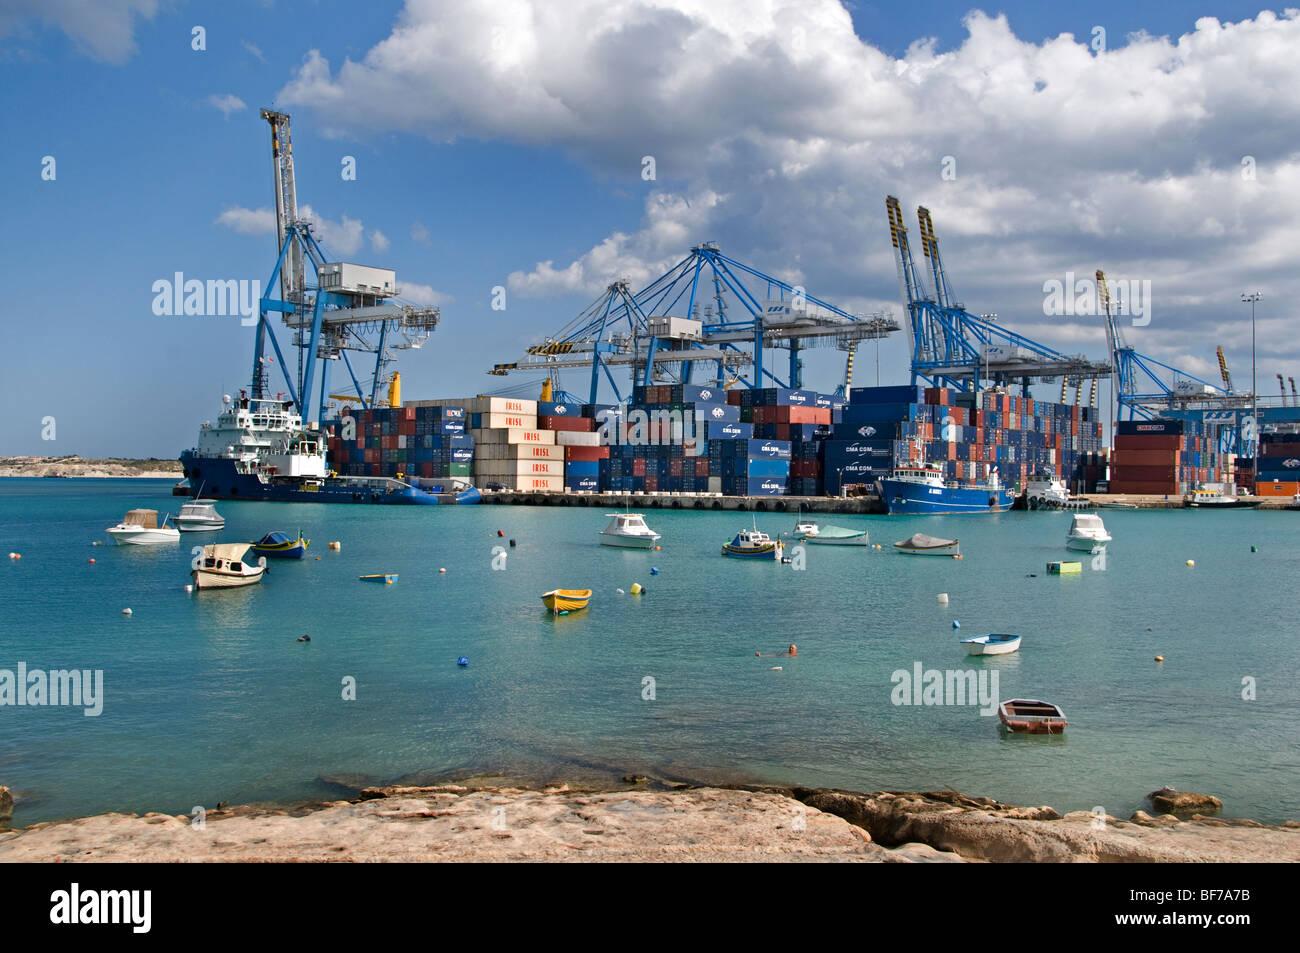 Hafen Hafen Salina Bay Container Malta Malta Stockbild